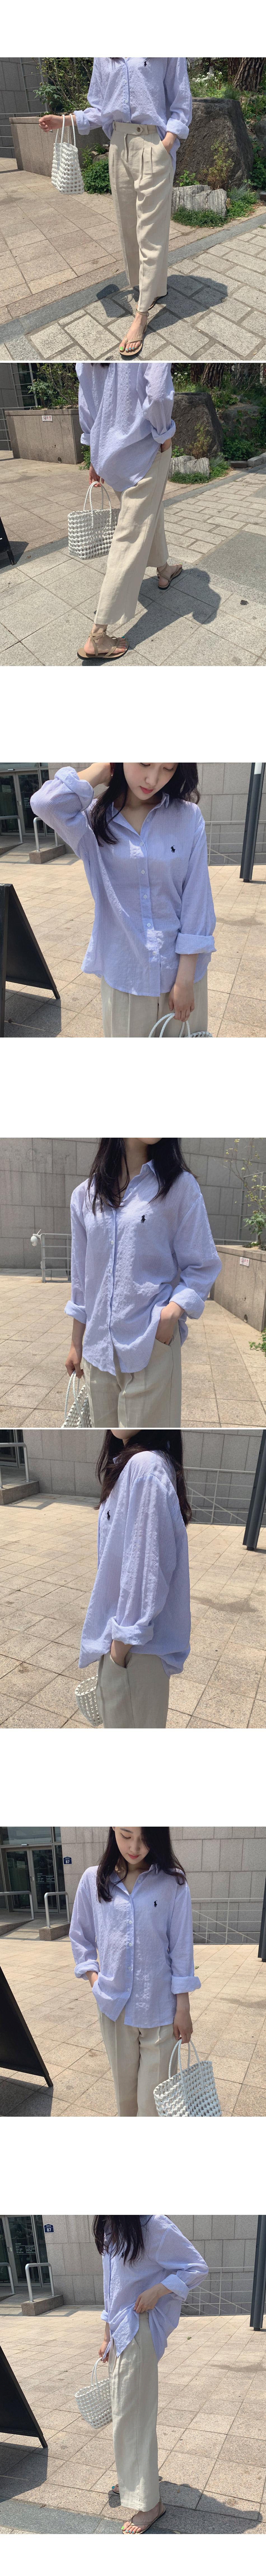 Sky Stripe Shirt _H